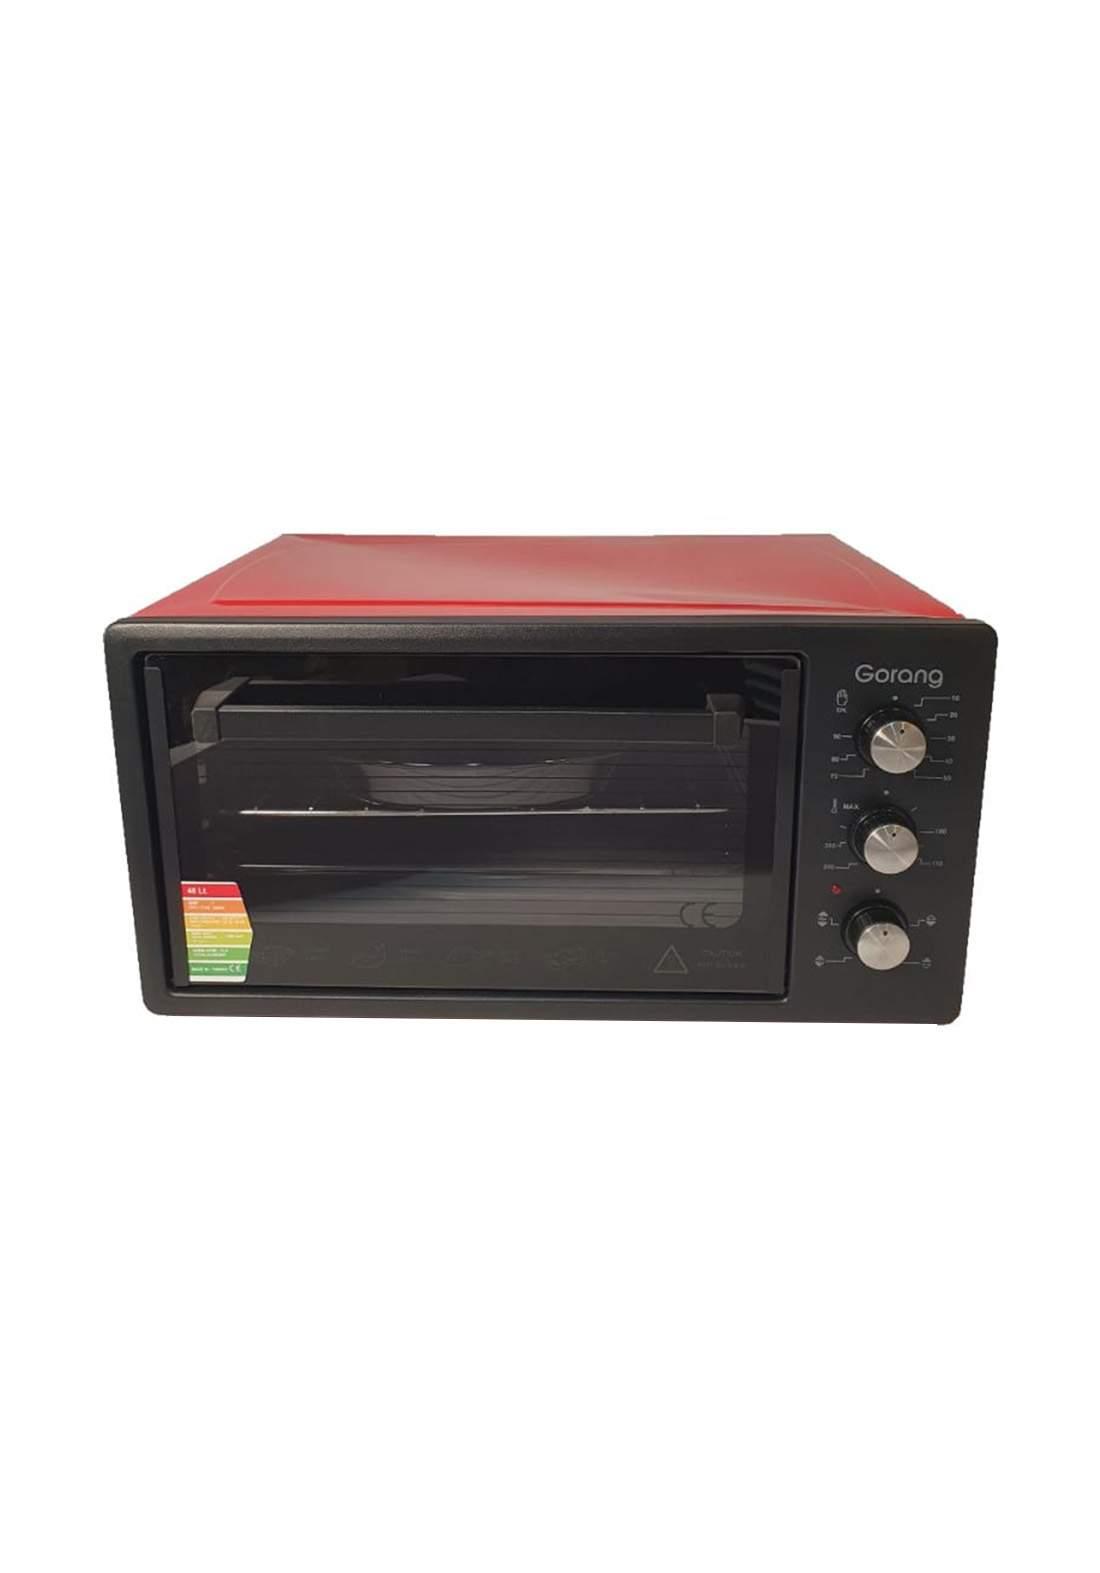 Gorang GOR-4225 Electric Oven  فرن كهربائي